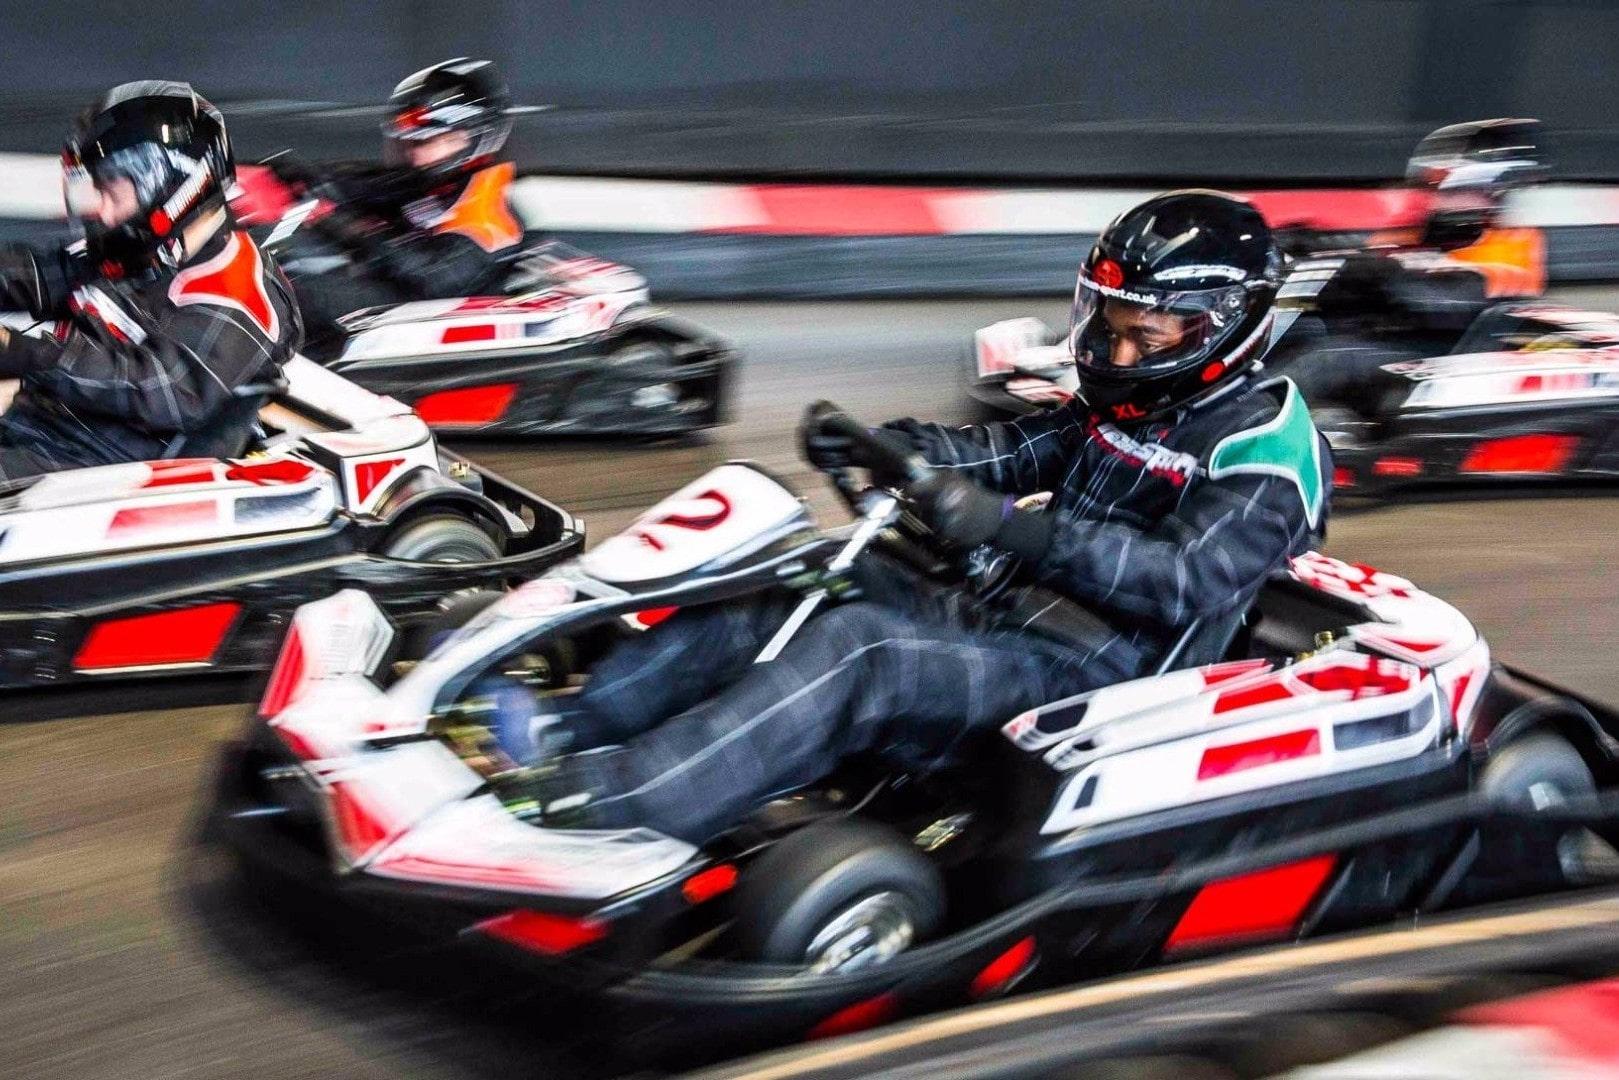 four-people-go-karting-at-teamsport-karting-indoor-activities-southampton